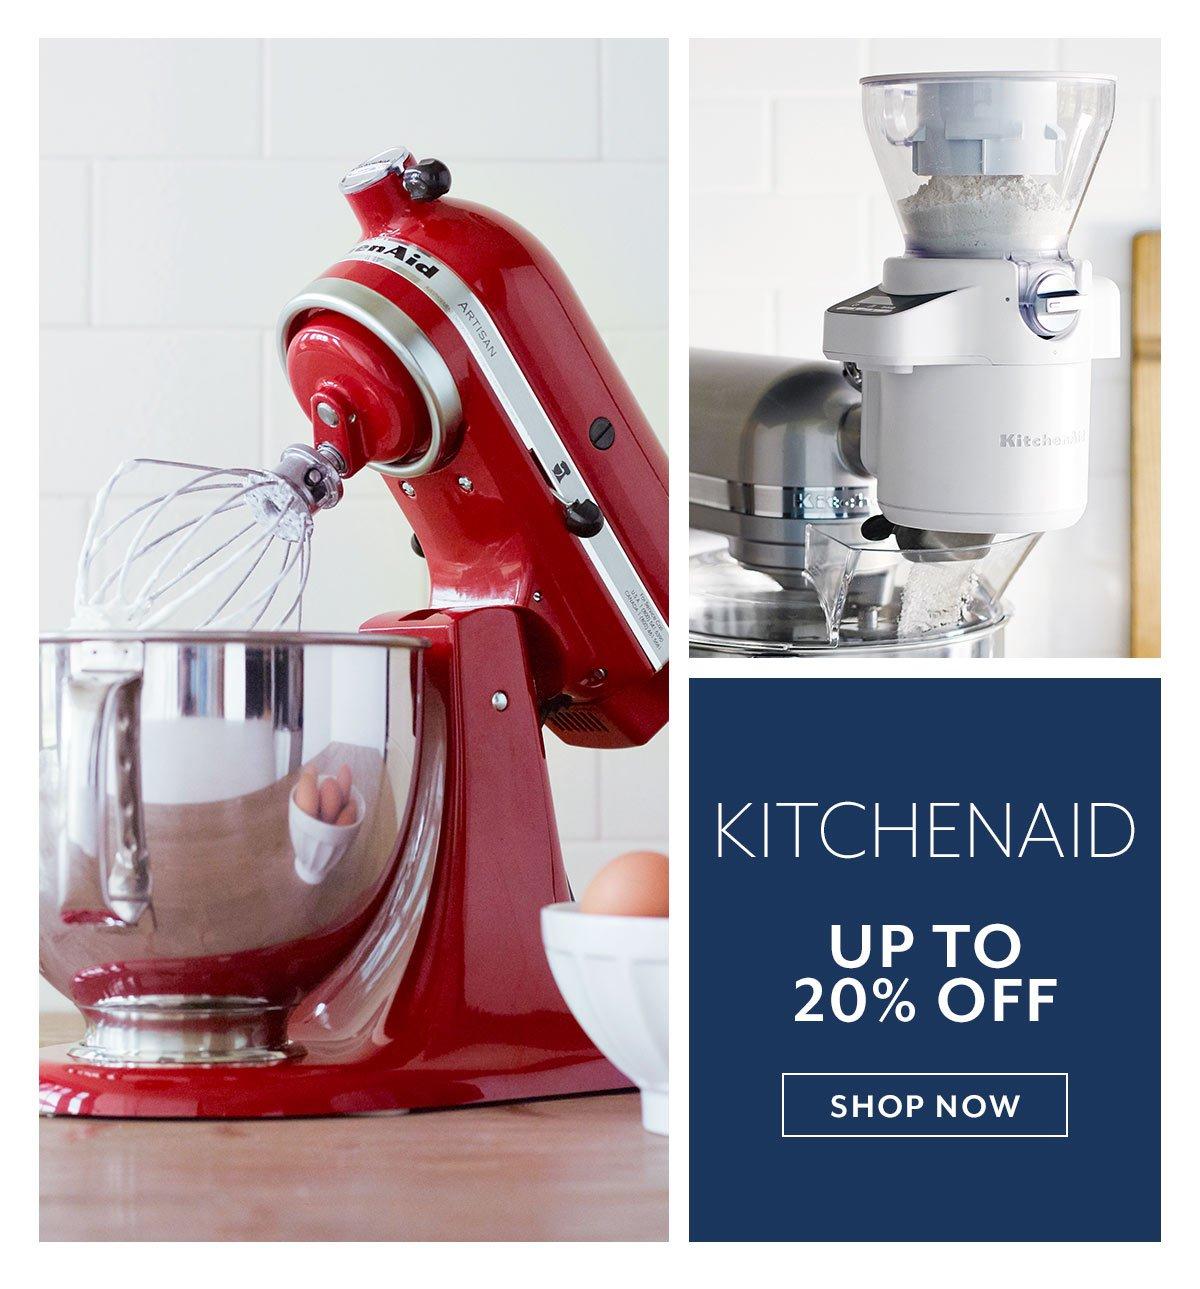 KitchenAid up to 20% off